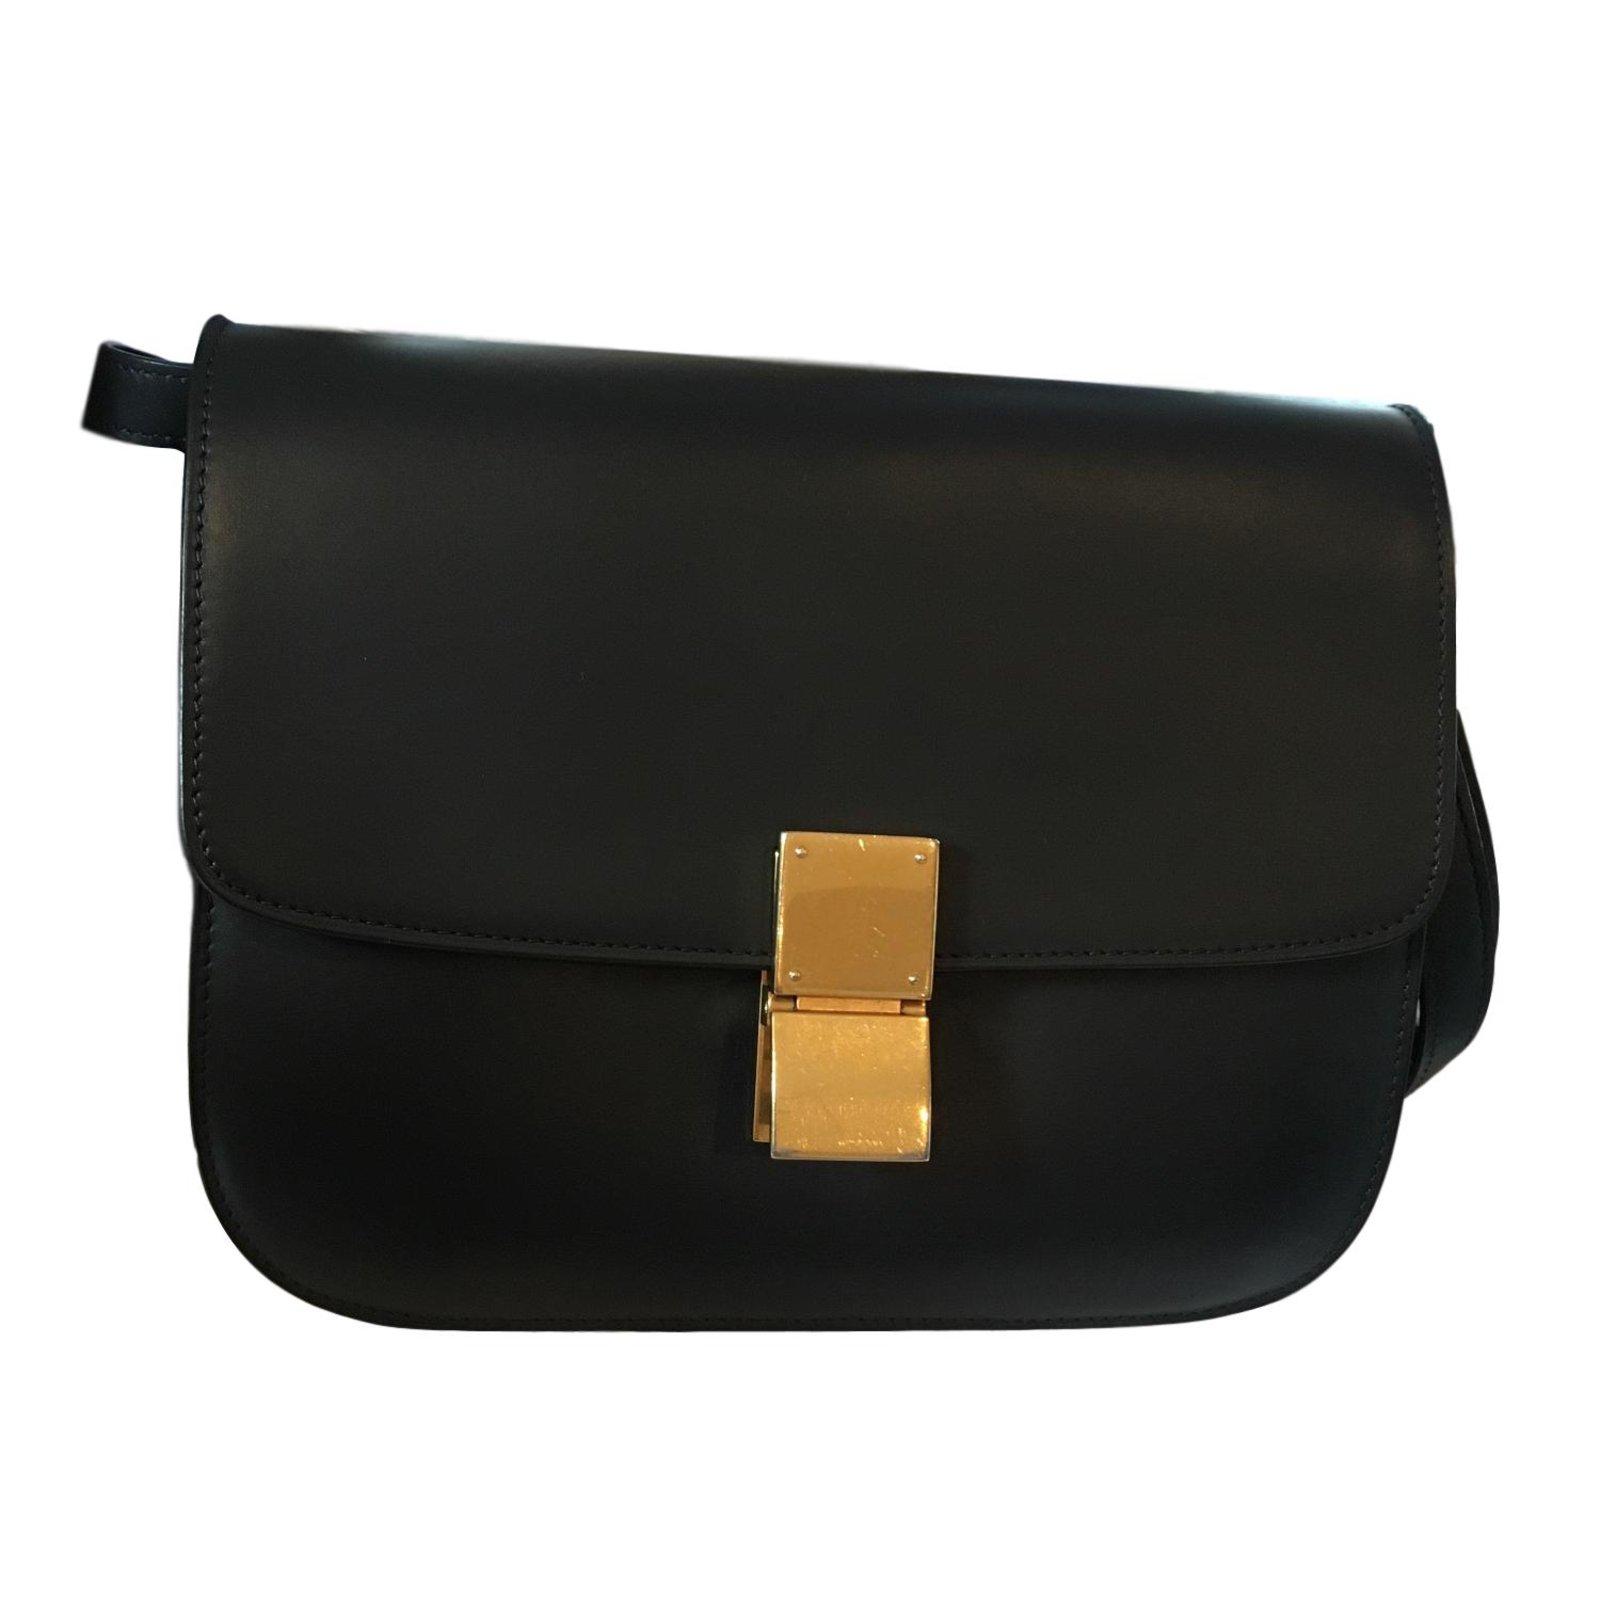 6d17568e9dcbf6 Céline Classic Box Handbags Leather Black ref.71992 - Joli Closet